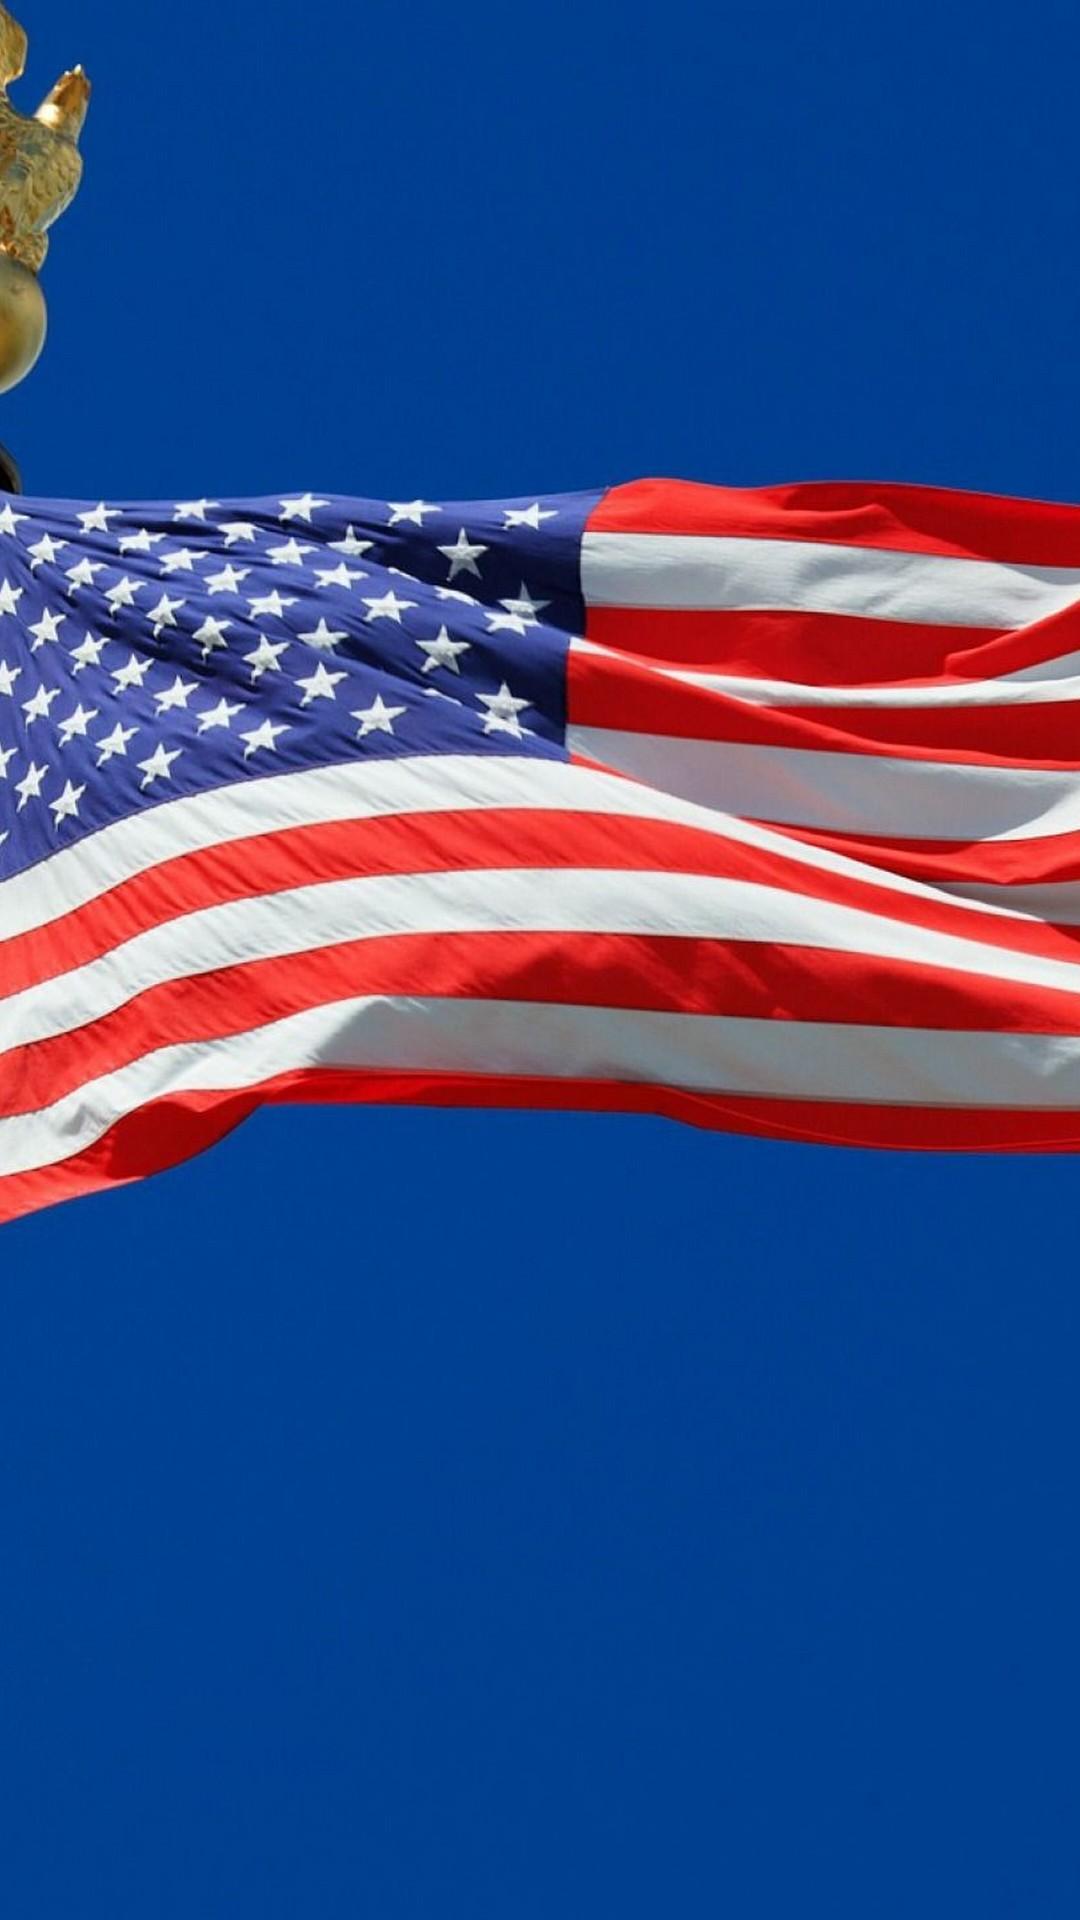 American Flag Iphone 6 Wallpaper Hd With High Resolution Iphone 6 Wallpaper American Flag 1080x1920 Download Hd Wallpaper Wallpapertip